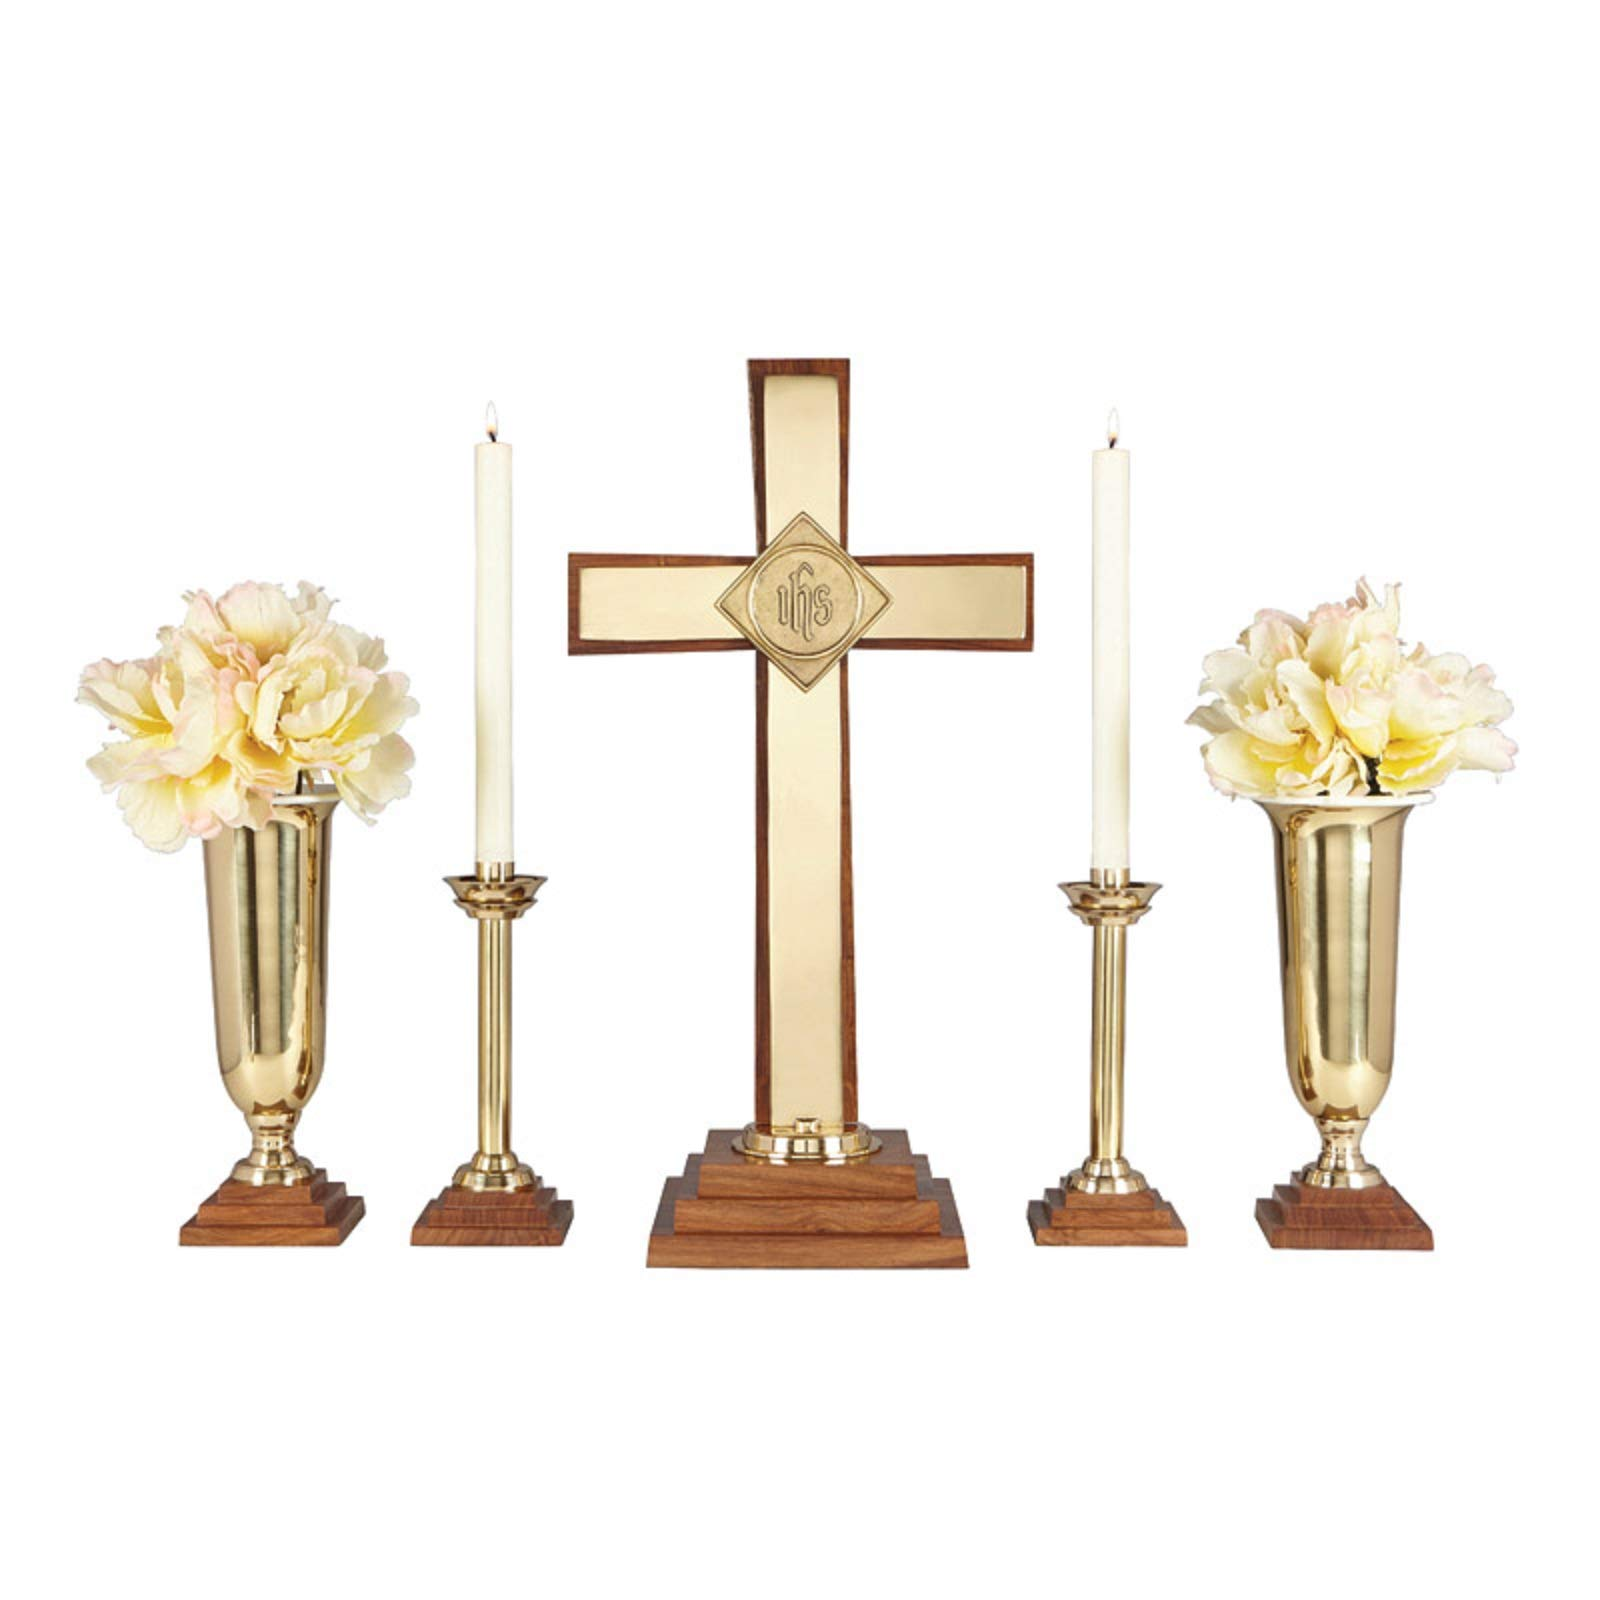 Wood/Brass 24'' Altar Set Includes YC505-24, YC506-10 and YC507-11